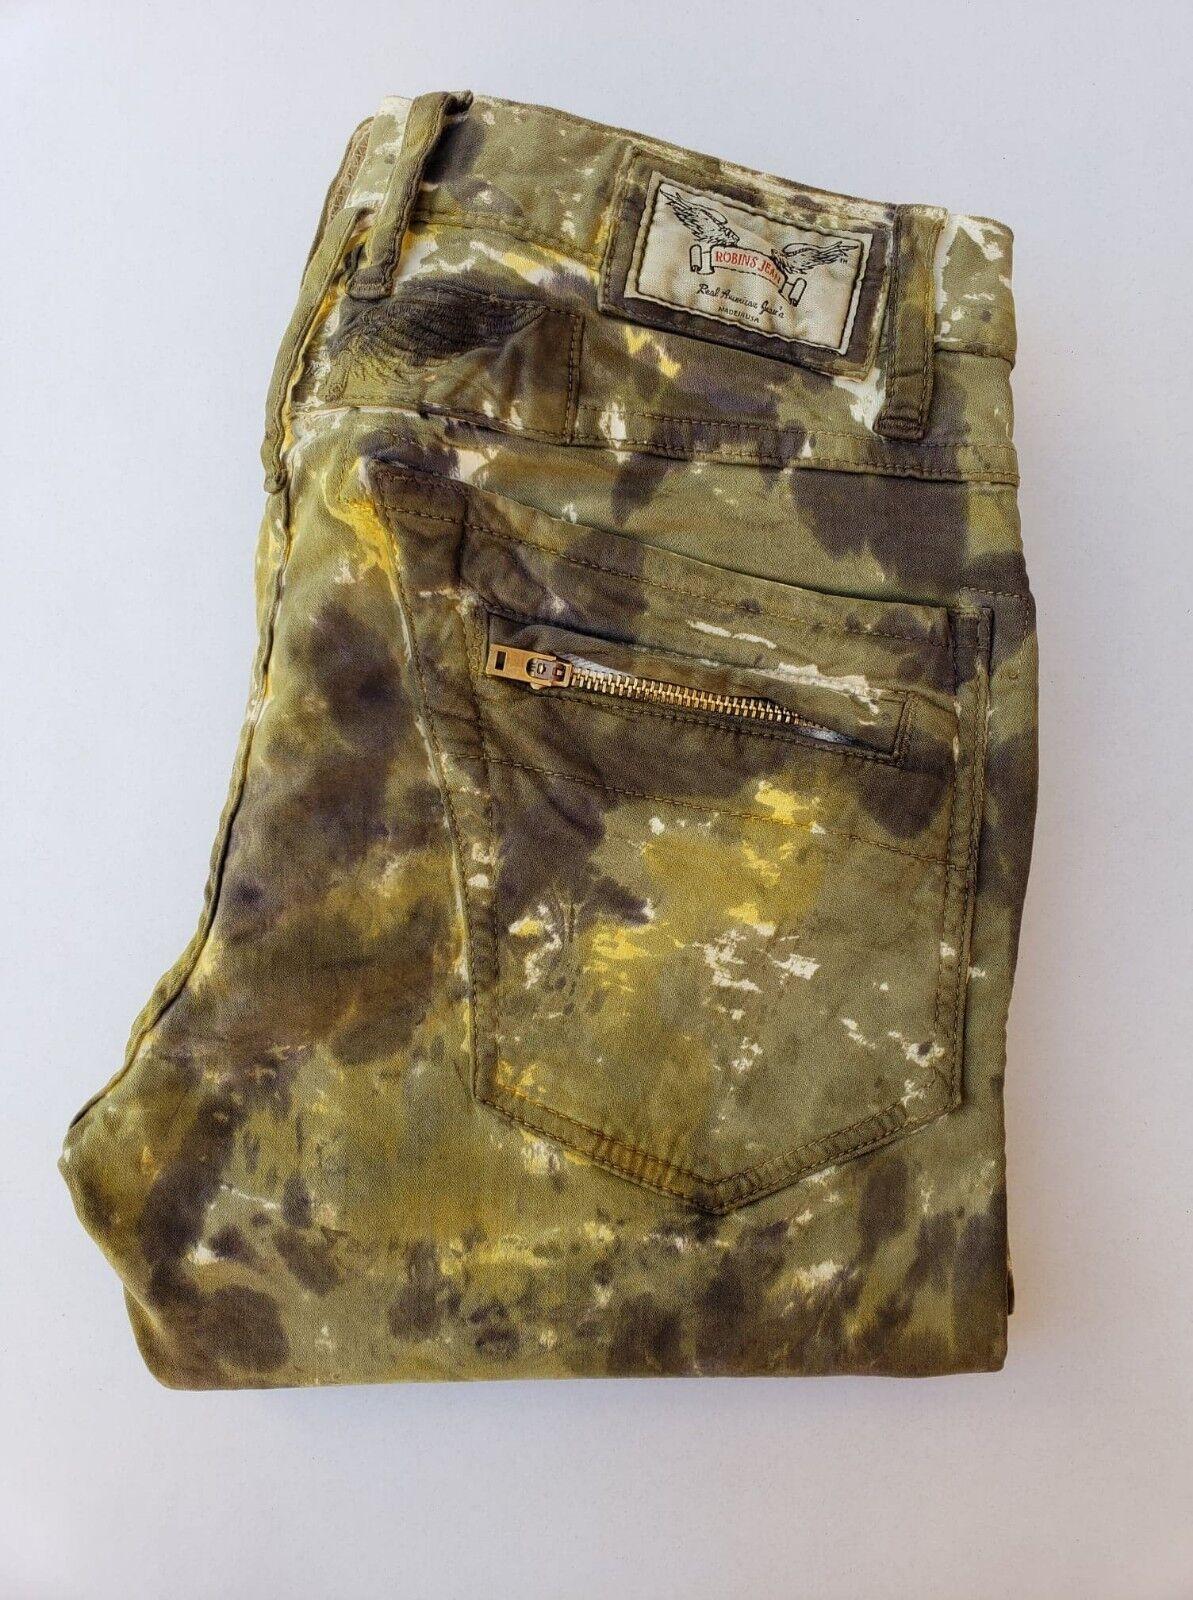 Nuovo da Uomo di ROBIN Jeans Jeans Jeans Taglie 29 Motard Slim Camo Jeans 339986